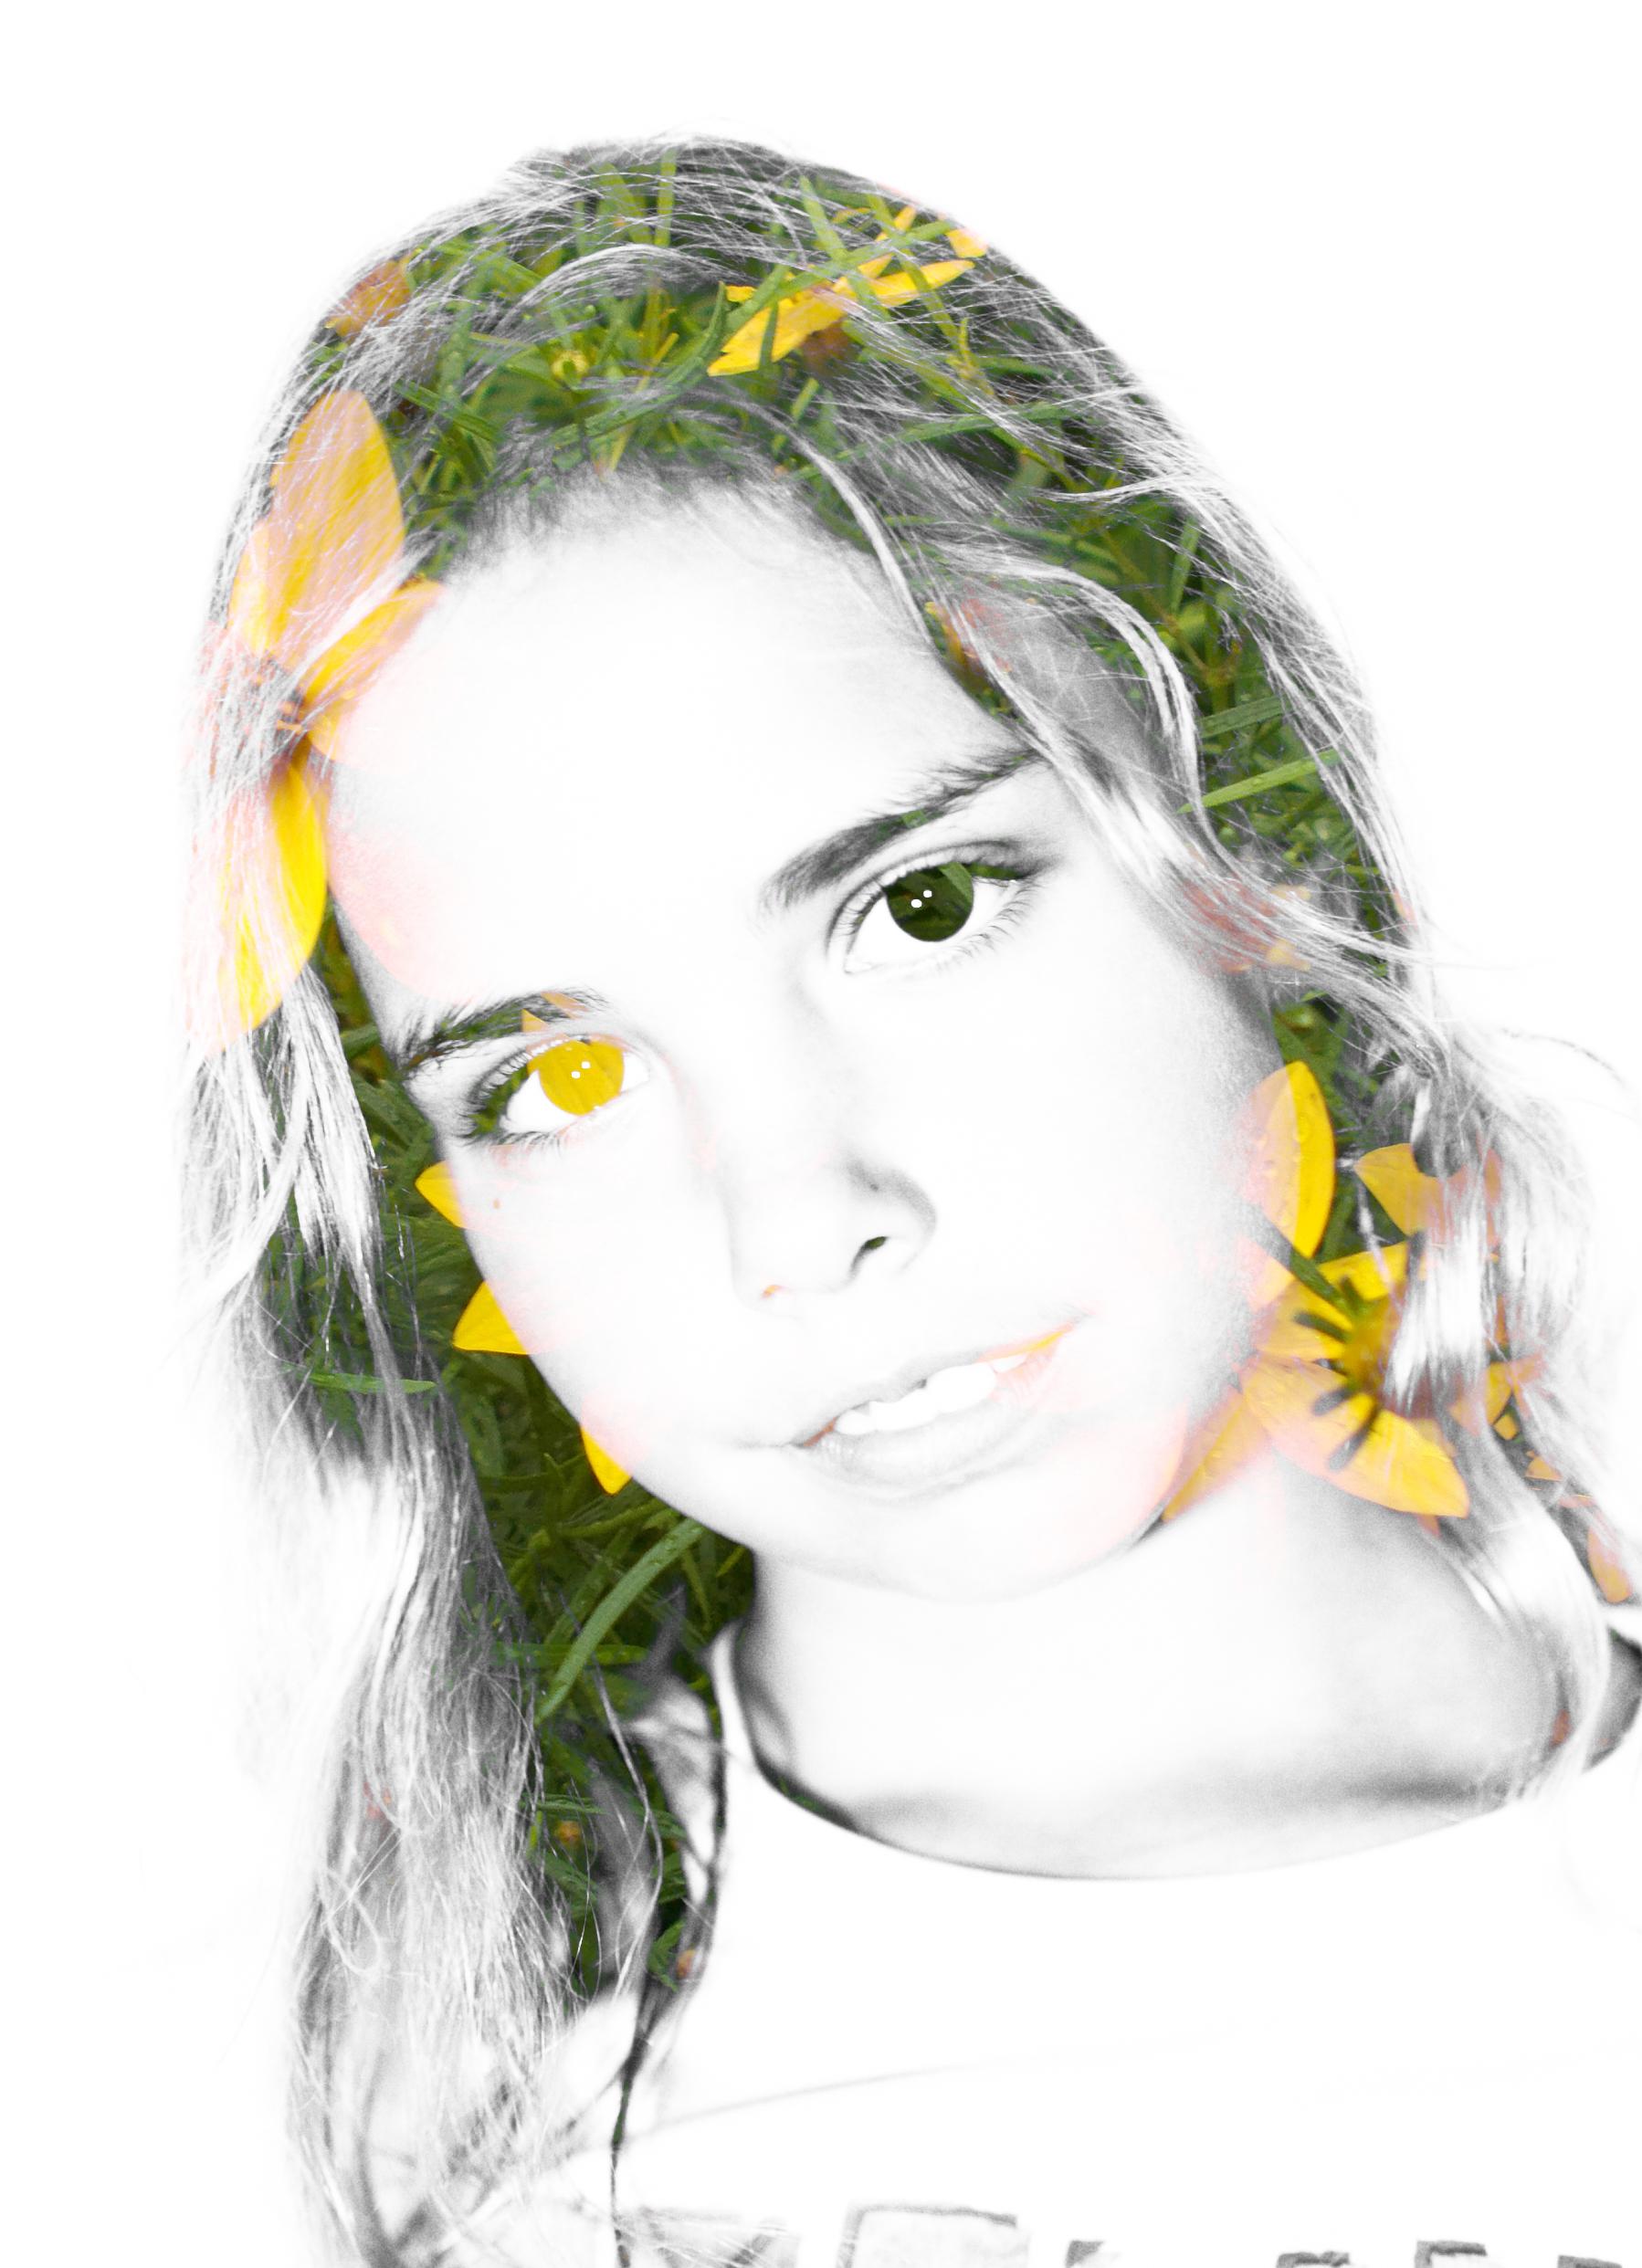 Kyel, Photoshop Layers Portrait